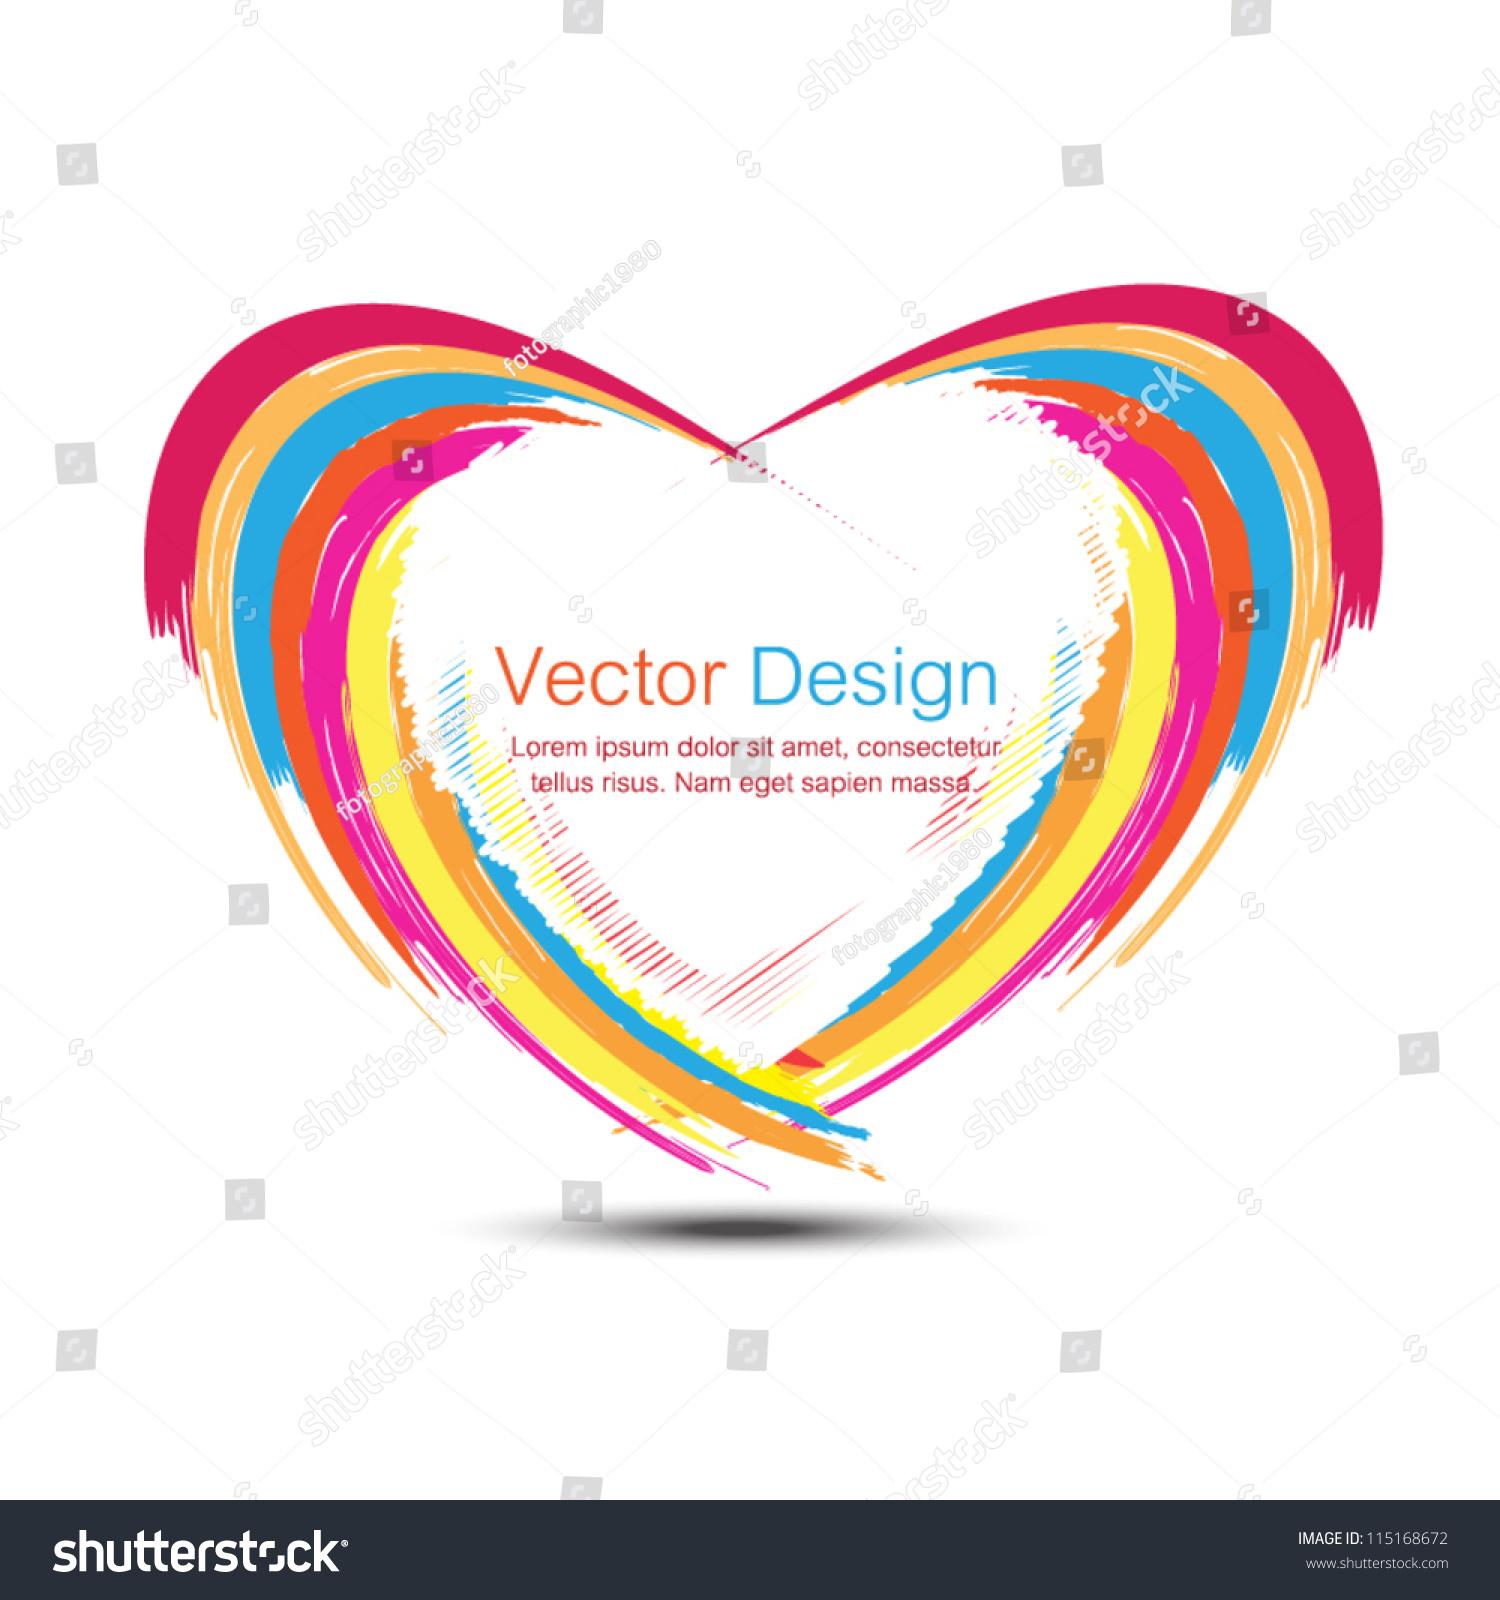 Vector Abstract Rainbow Heart Frame Design Stock Vector (Royalty ...